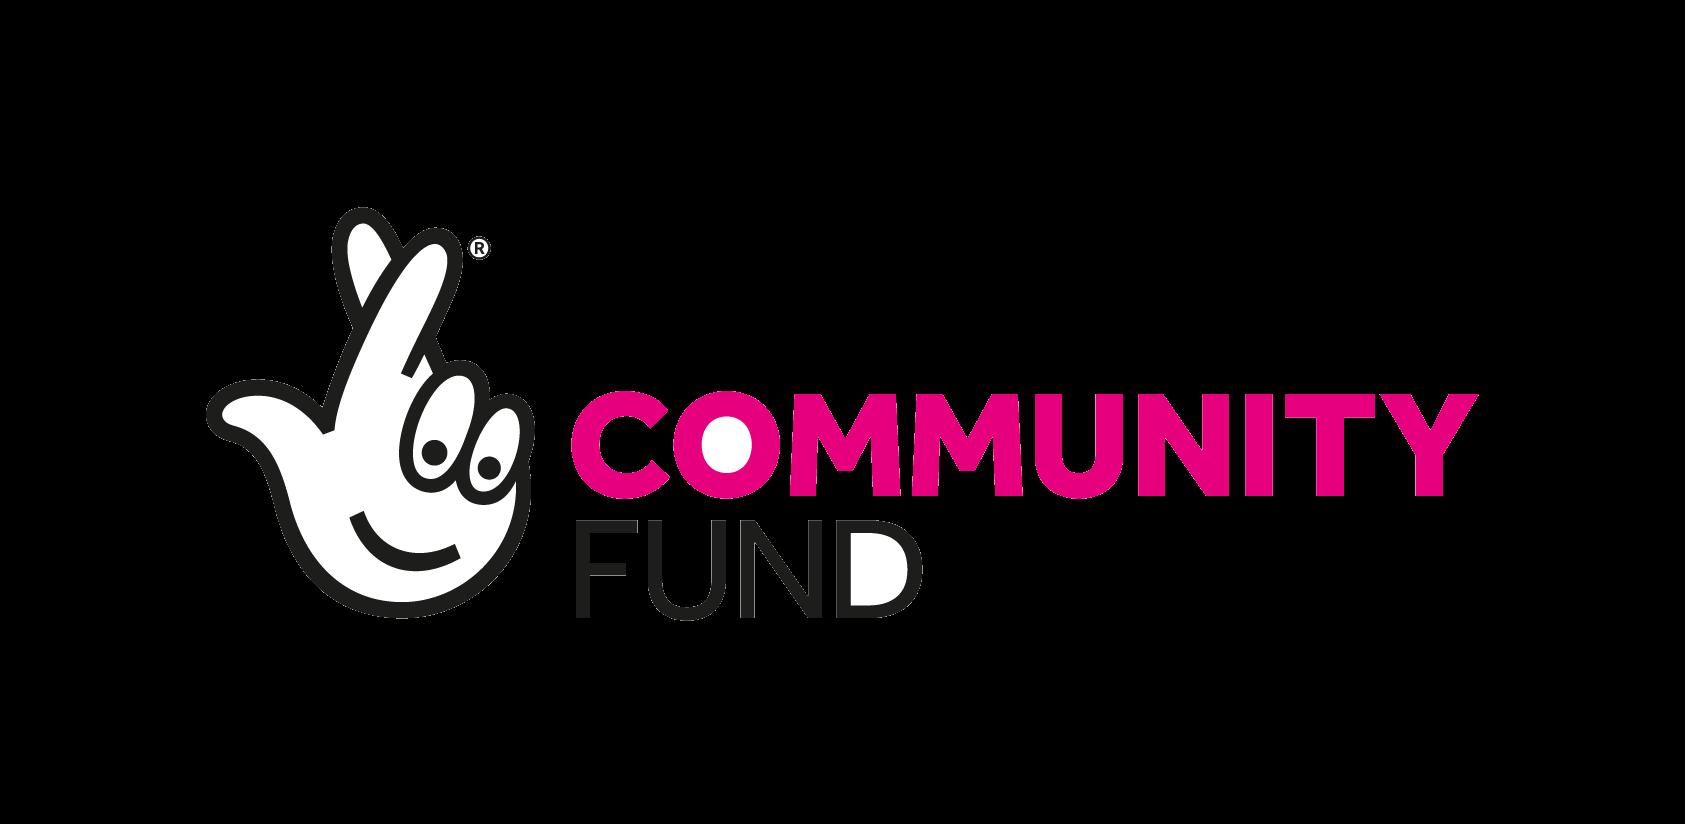 Lottery Community Fund